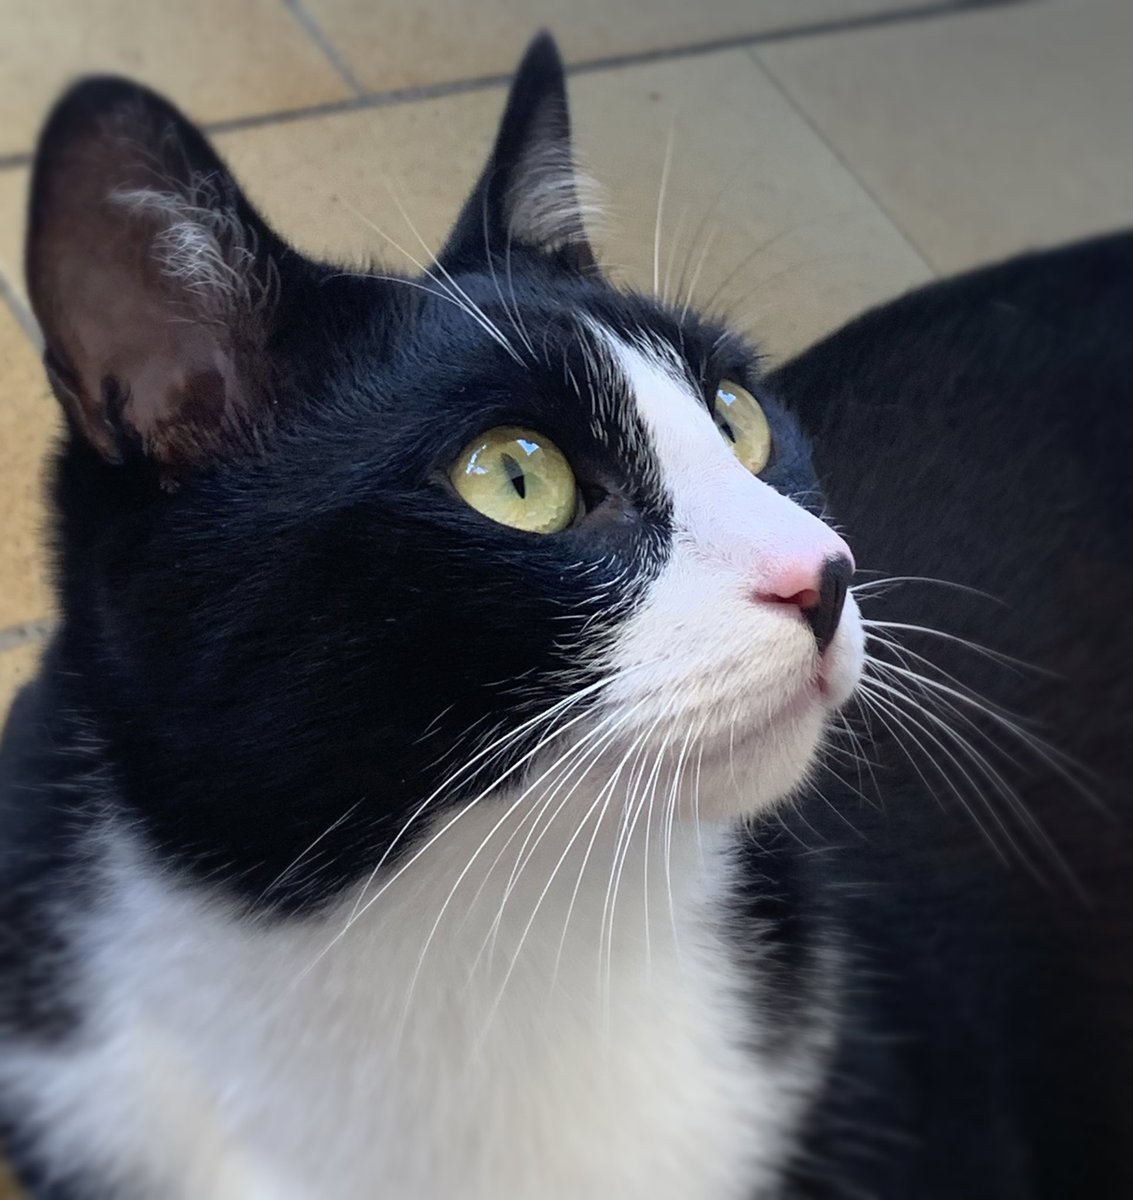 ARTÙ careful watcher | #cats #creativity #pets #meow #pets #kittens #kitten #catlife #catoftheday #kitty #cute #world #love #pet #dogs #animals #gatos #gato #lovecats #cutecats #love #life #follow #catlove #cutecat #petstagram #ilovemycat #animal #kittycatpic.twitter.com/EVxzlvcKc4